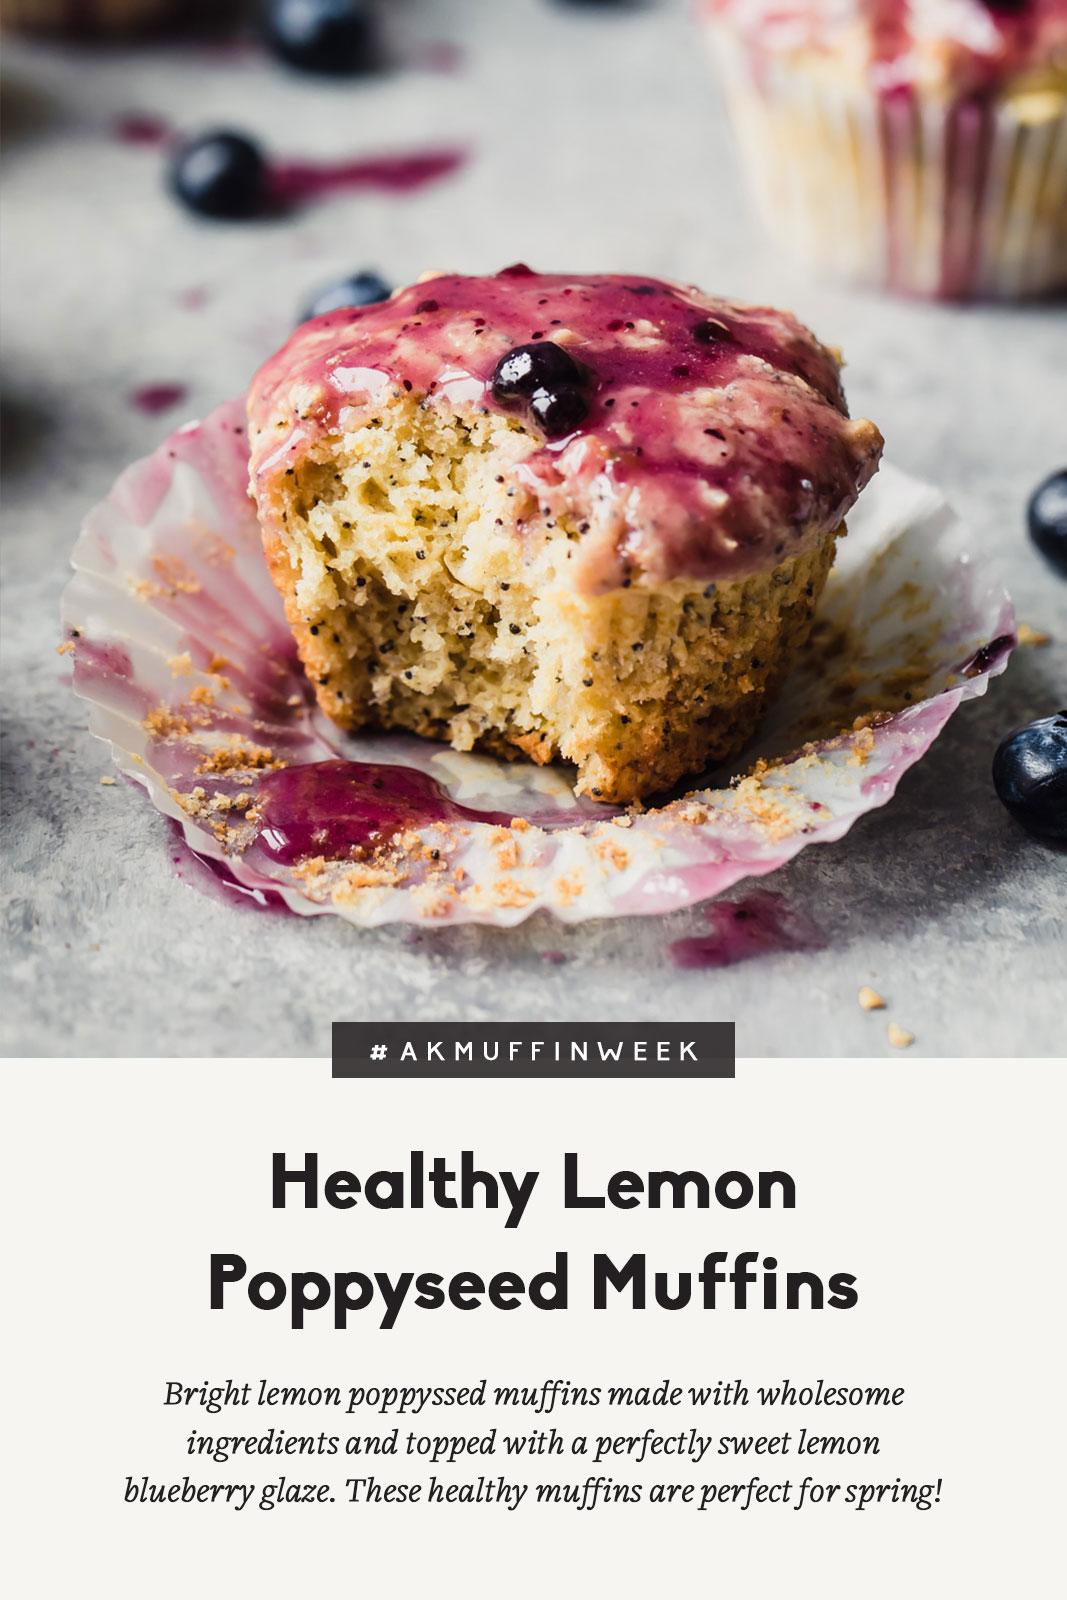 Lemon-Poppyseed-Muffin-Week.jpg